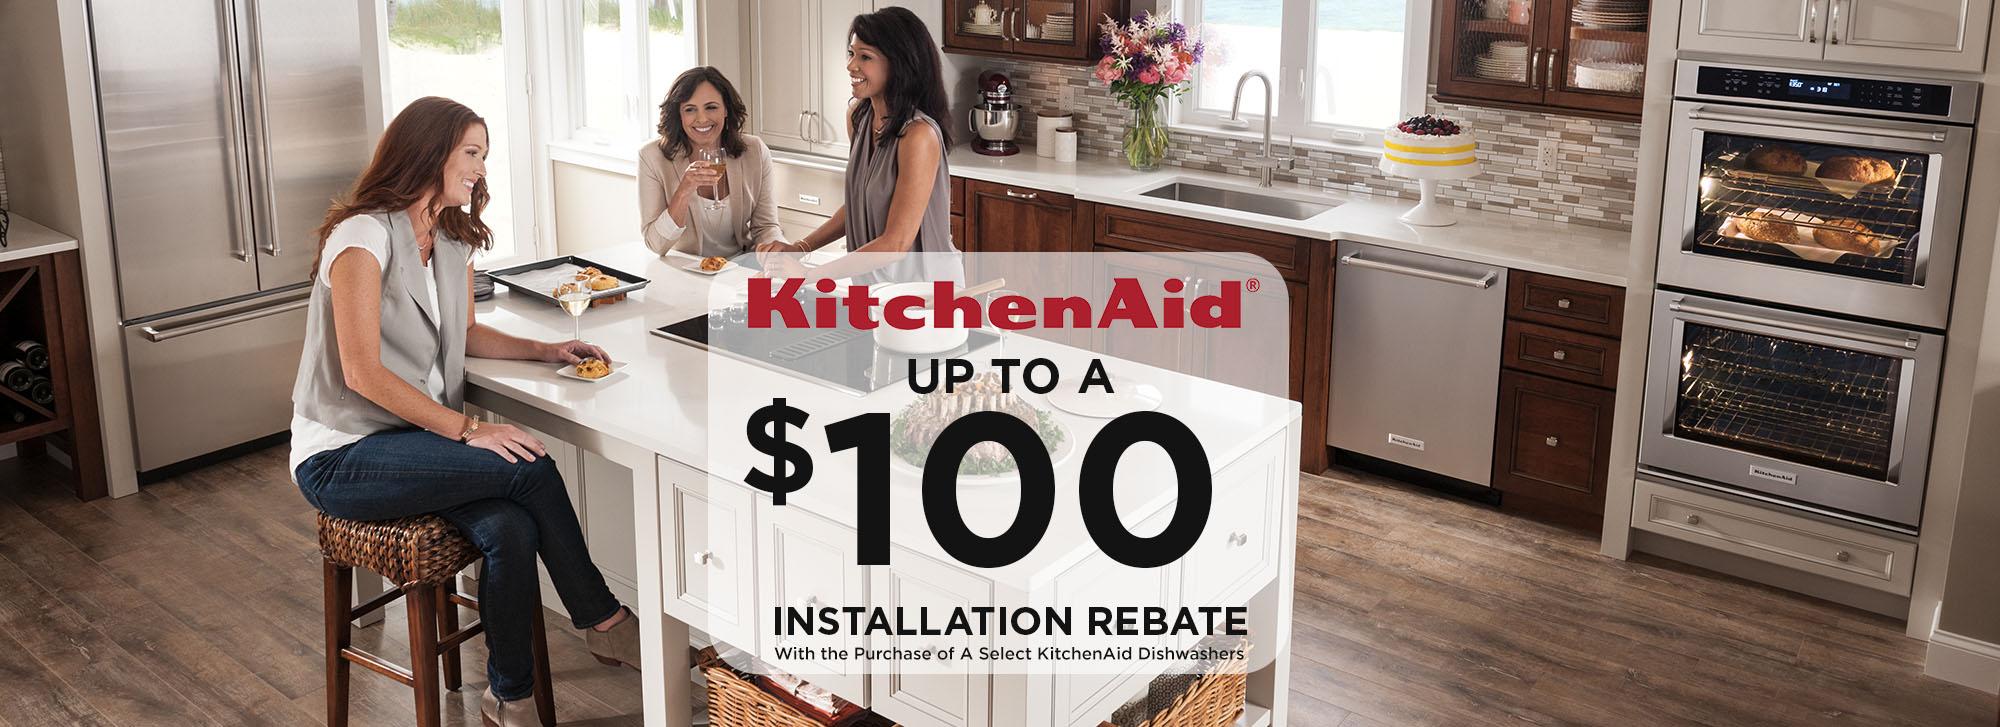 KitchenAid - $100 installation rebate Home Appliance, Kitchen ... on hamilton beach brands, meyer corporation, whirlpool canada, whirlpool corporation, kenwood chef, sunbeam products, amana corporation, kenwood limited,